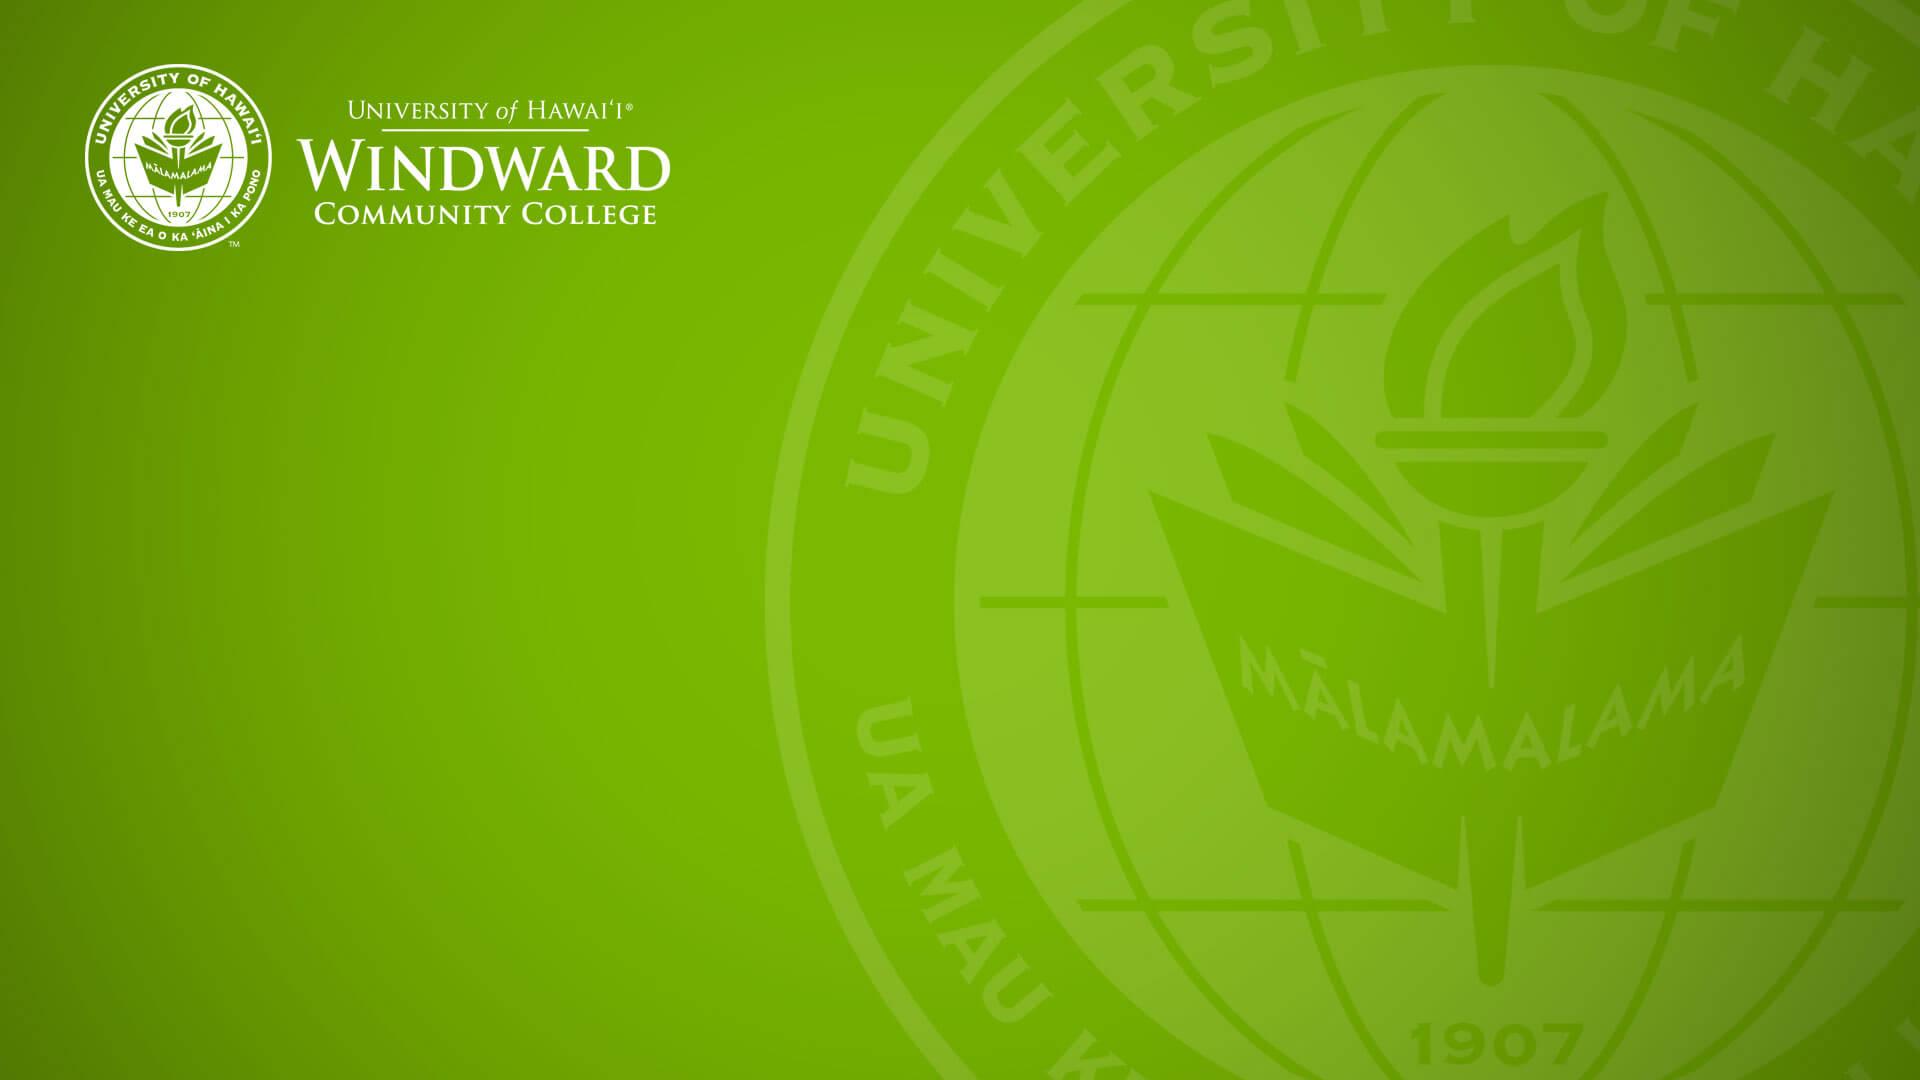 Windward C C seal and nameplate